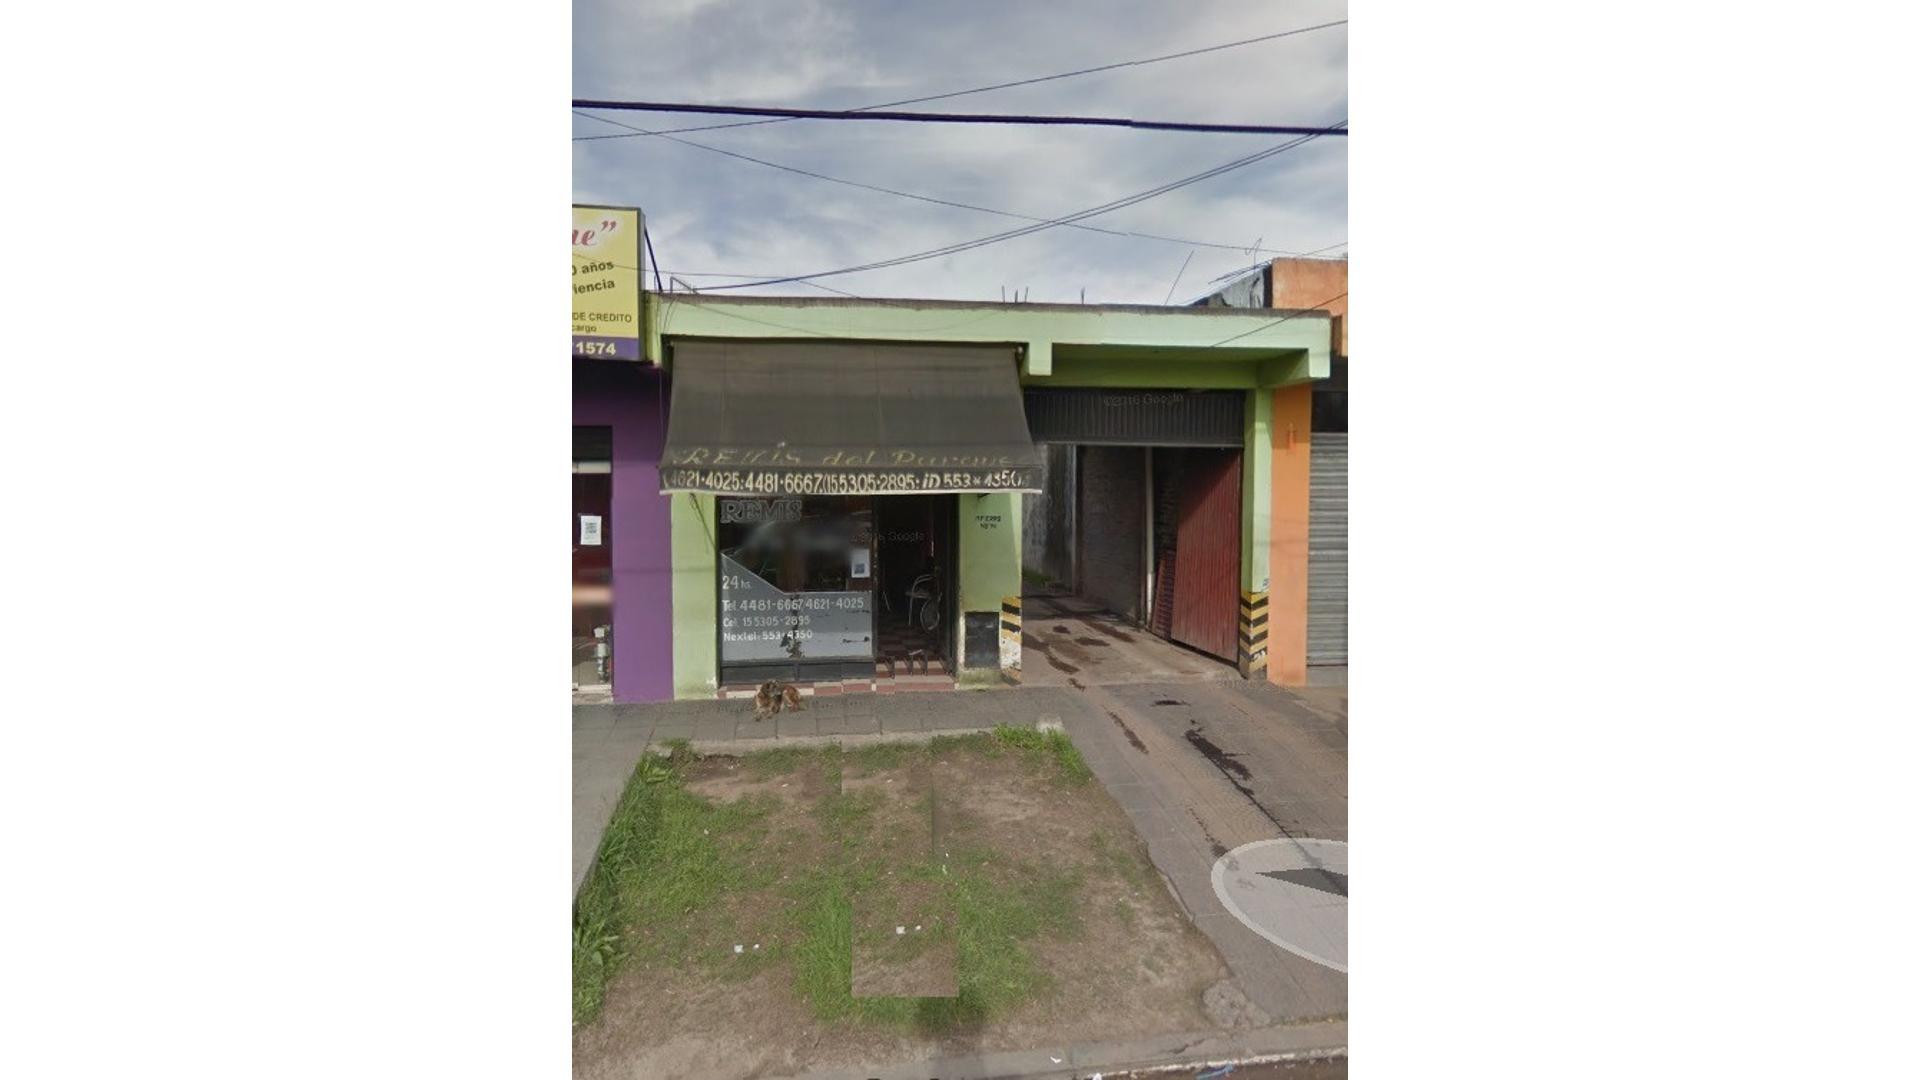 Martin Fierro 4000 - $ 18.000 - Local Alquiler